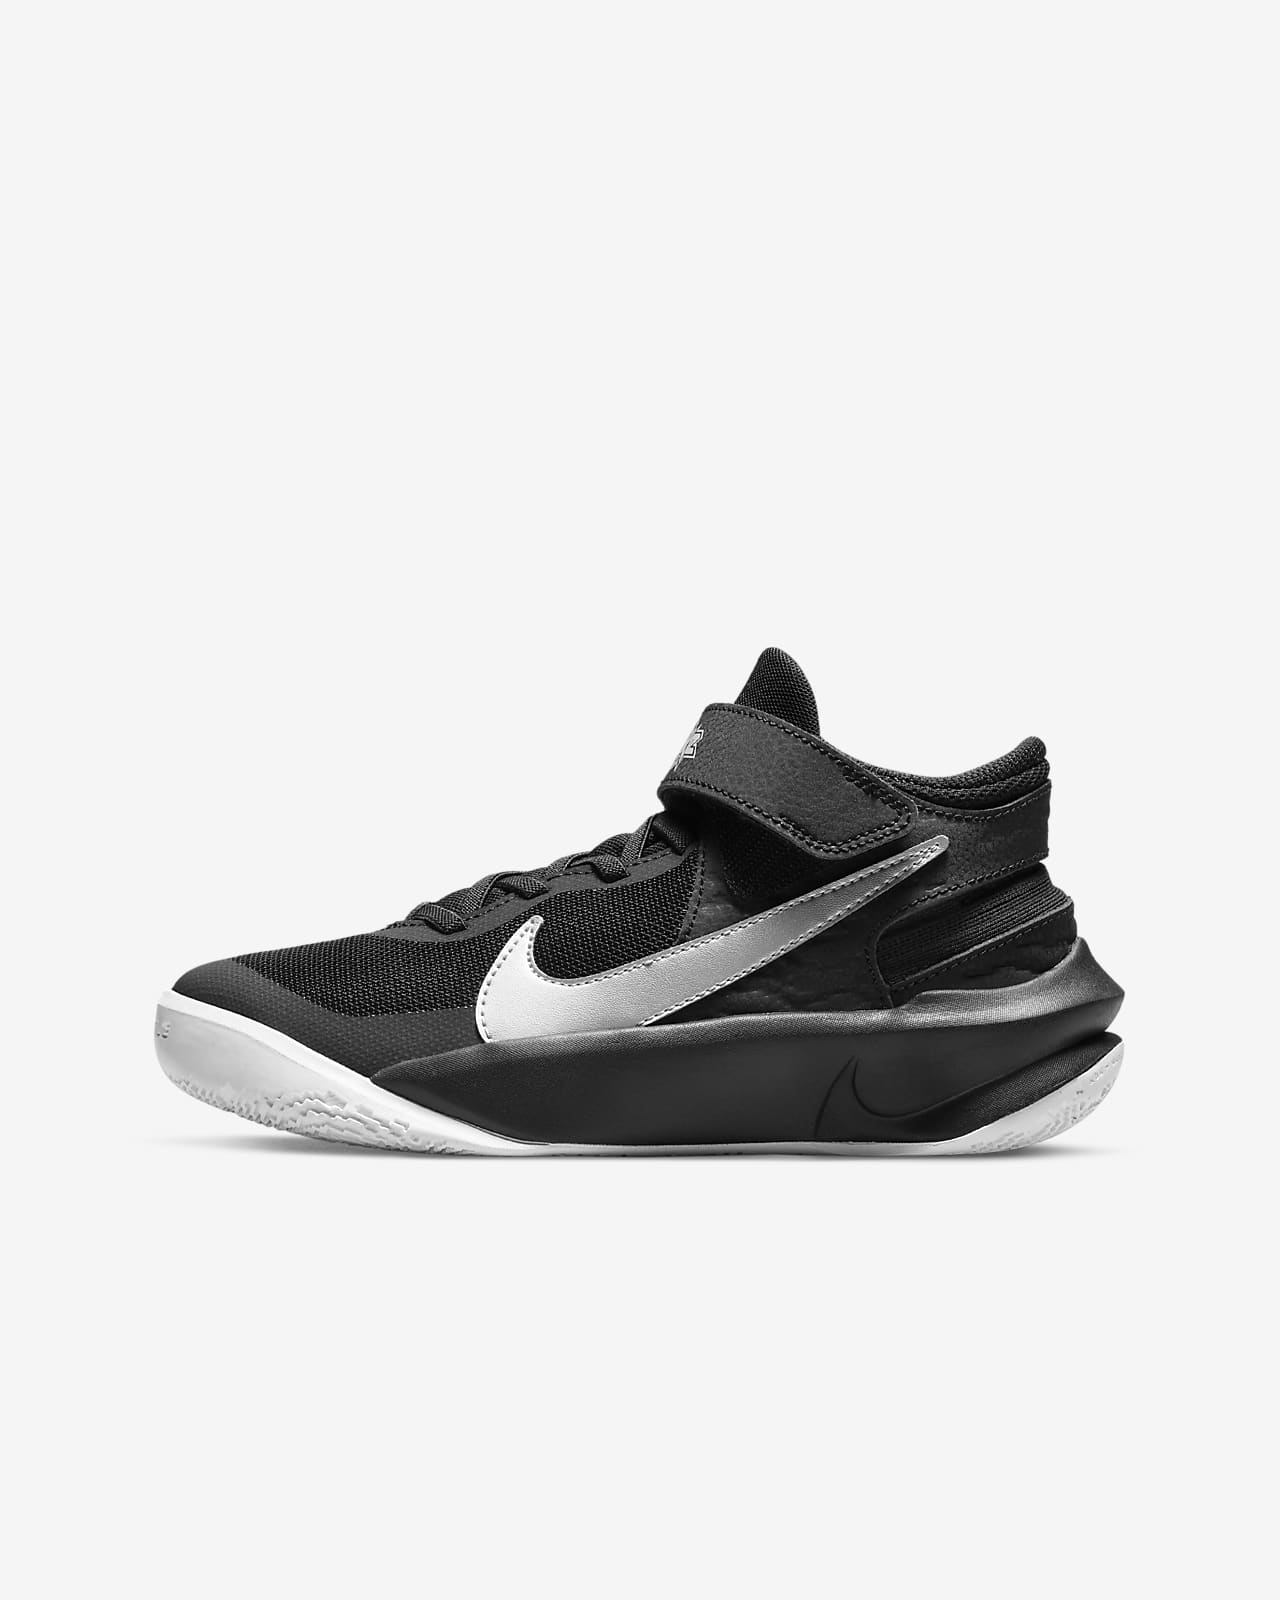 Nike Team Hustle D 10 FlyEase Older Kids' Basketball Shoe